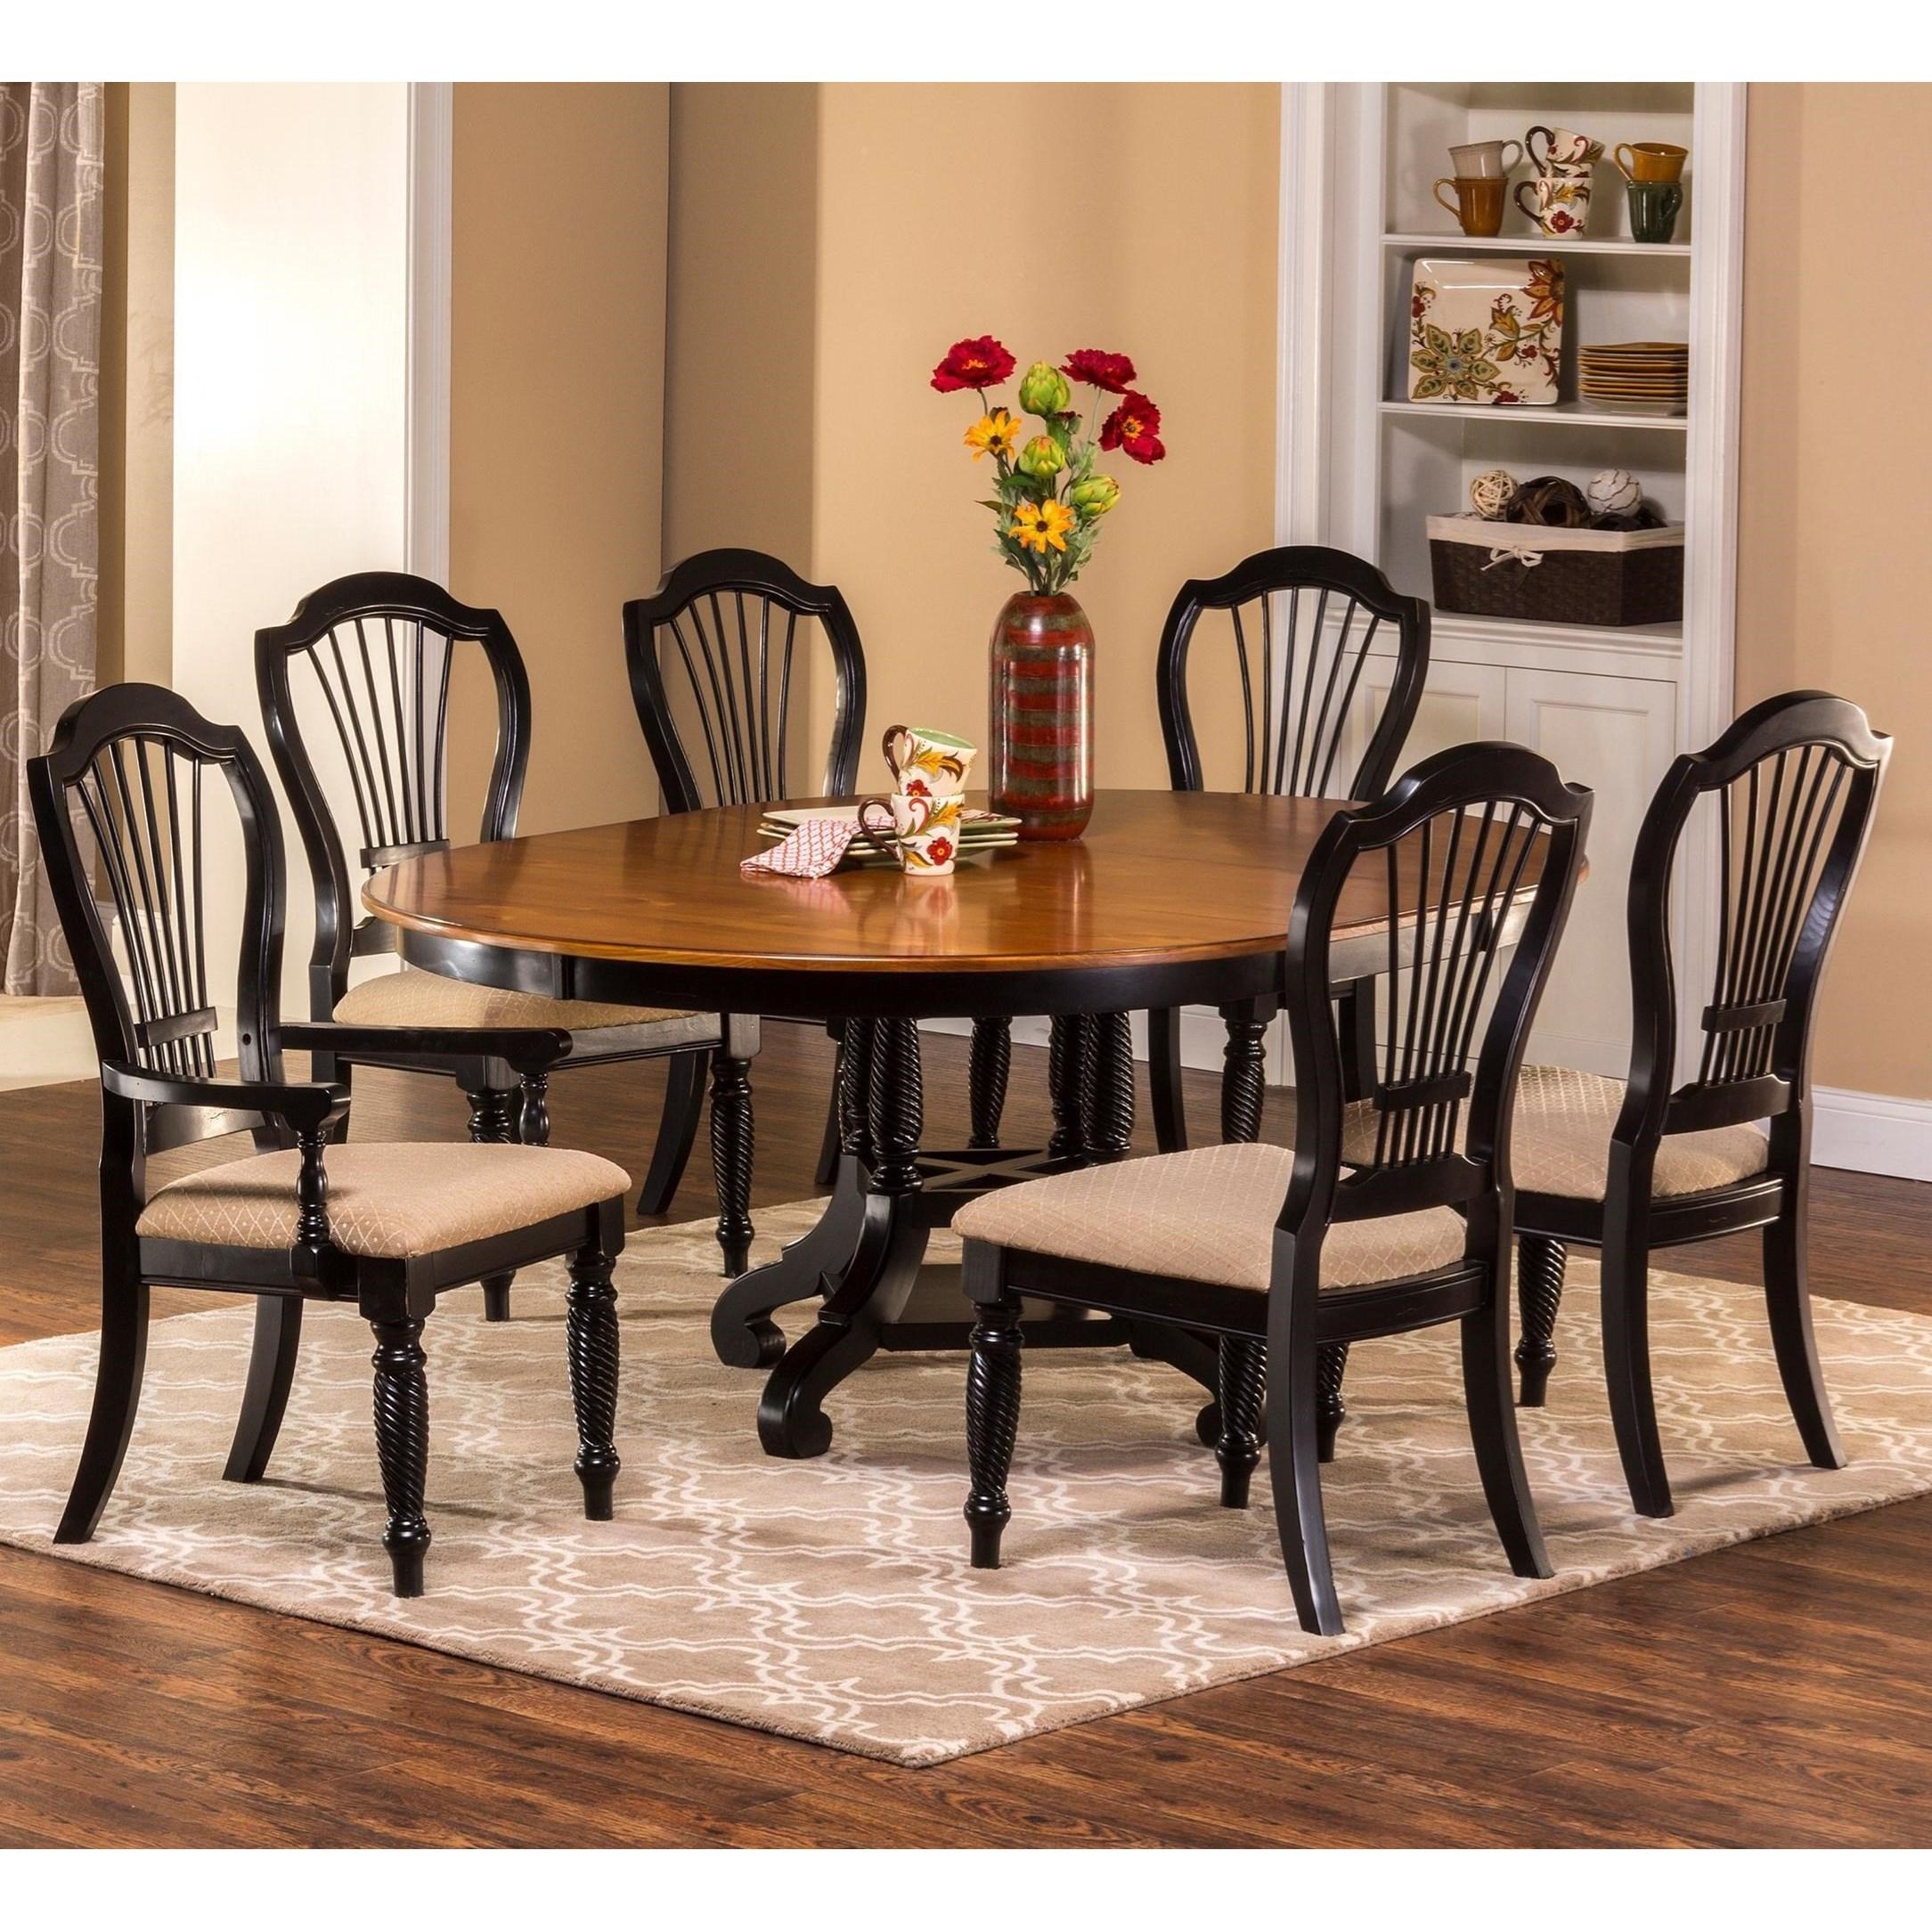 Hillsdale Wilshire 7 Piece Round Dining Set   Item Number: 4509DTBRNDC7